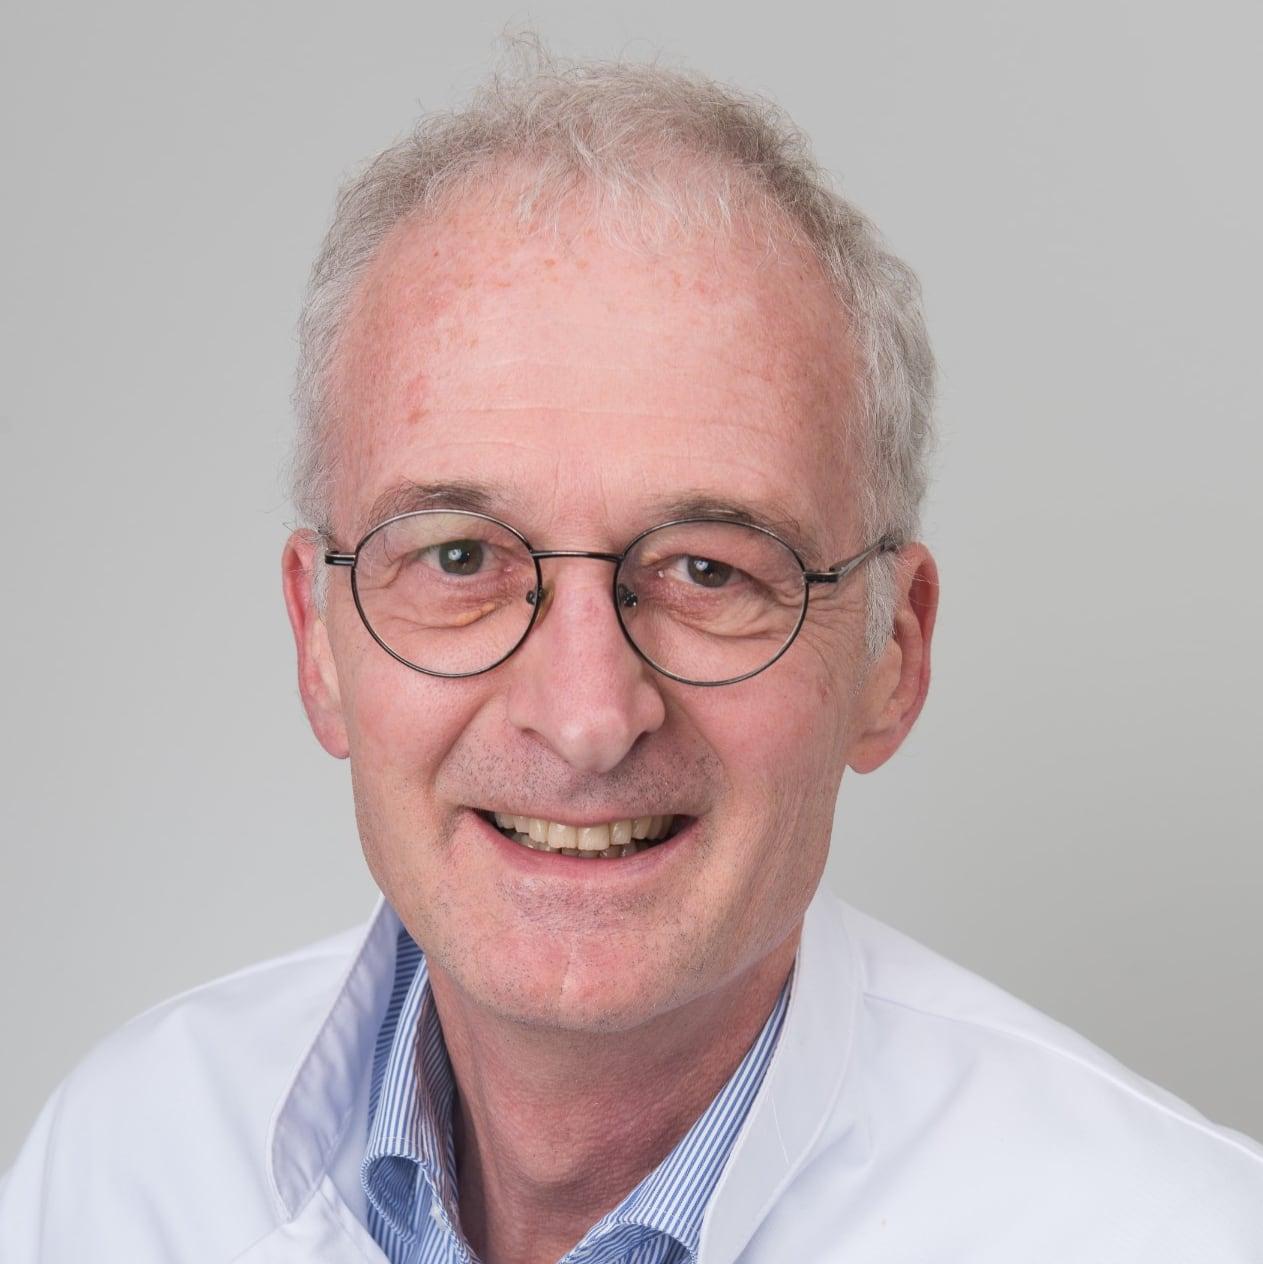 Prof. dr. Ernst van Heurn